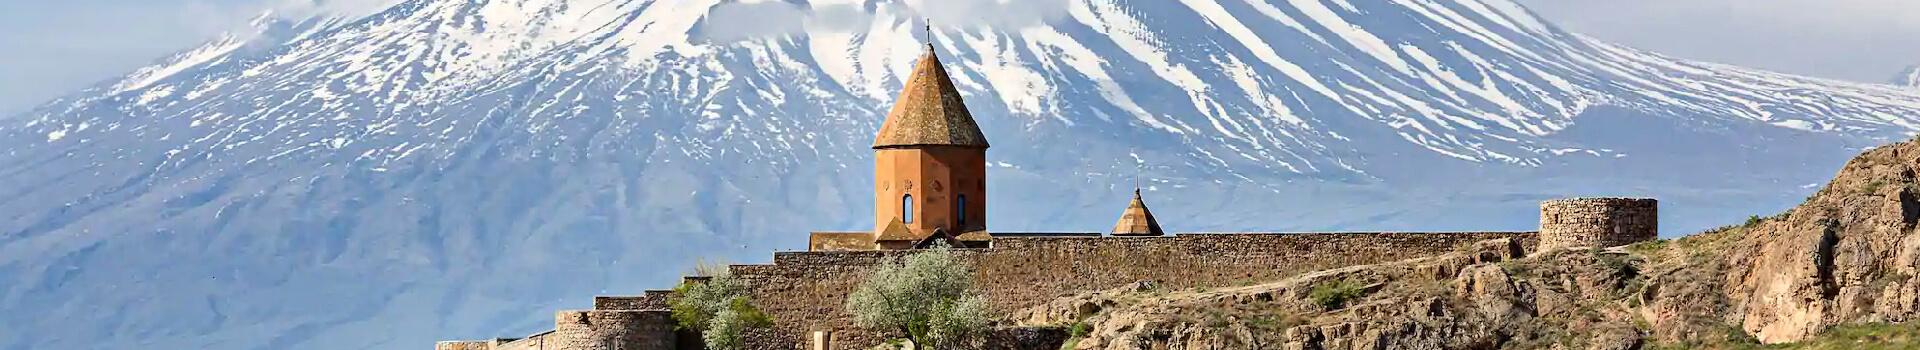 Viaje por Armenia